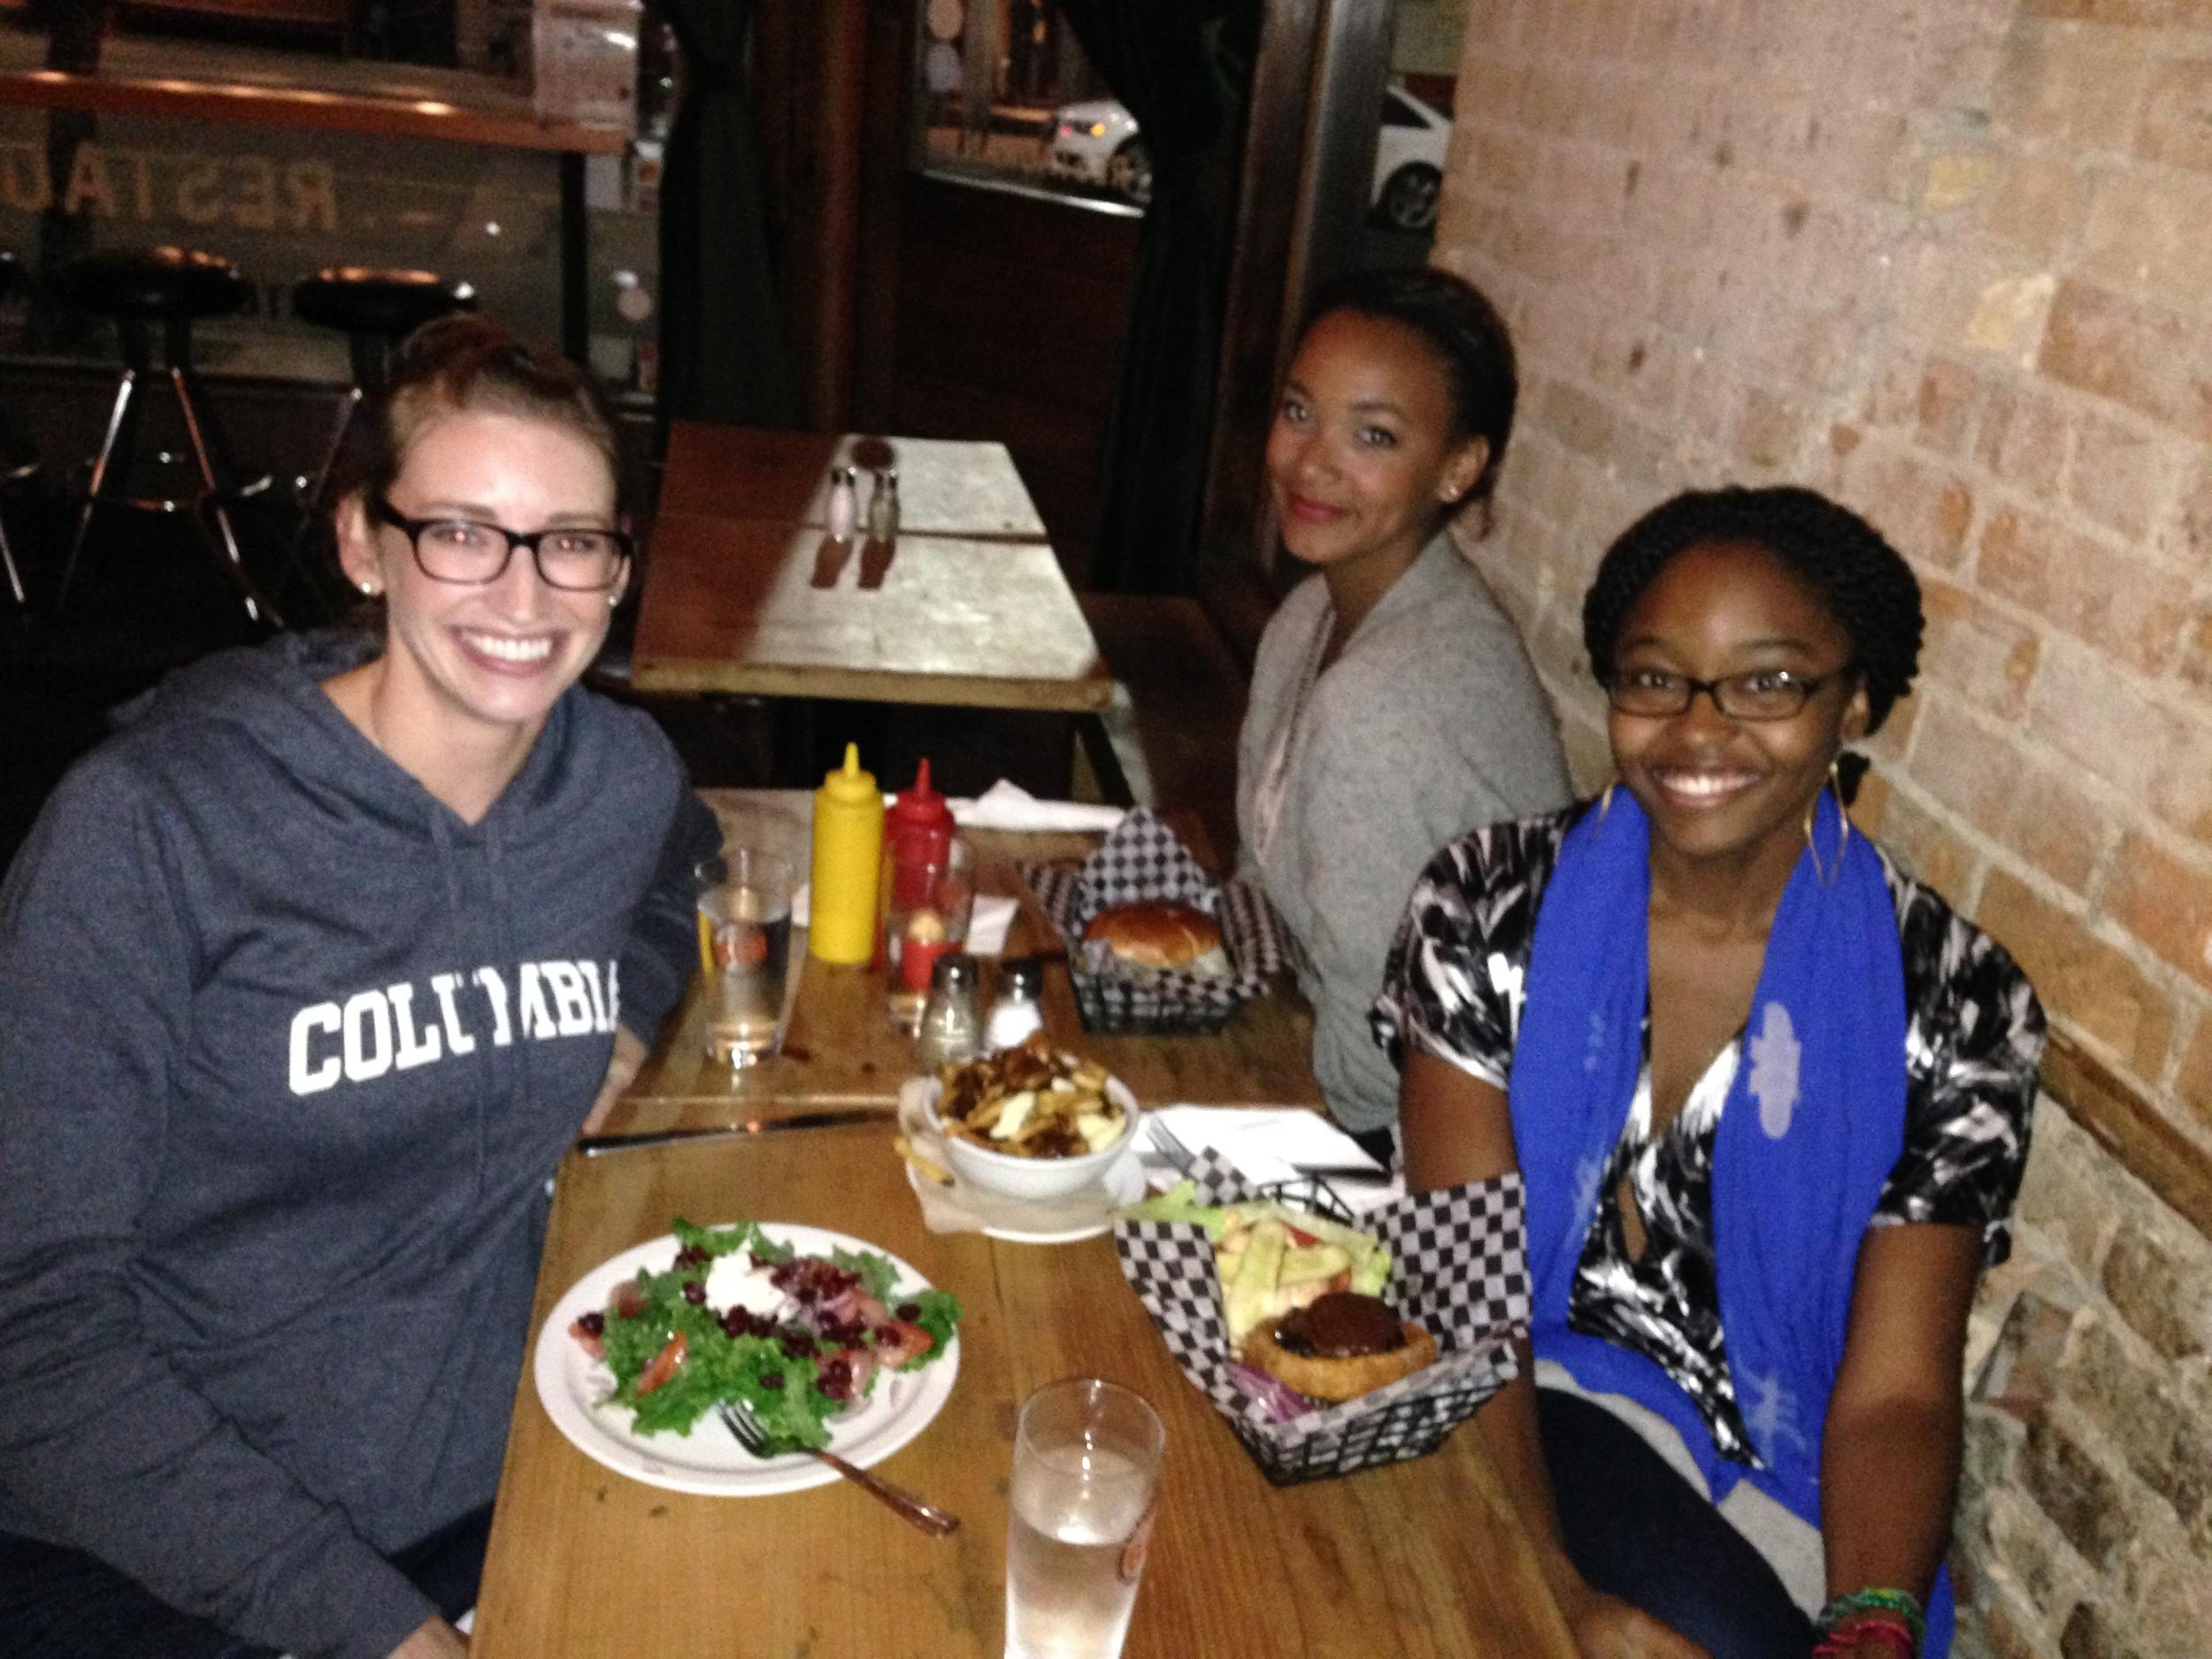 Friends enjoying a meal at BQM.